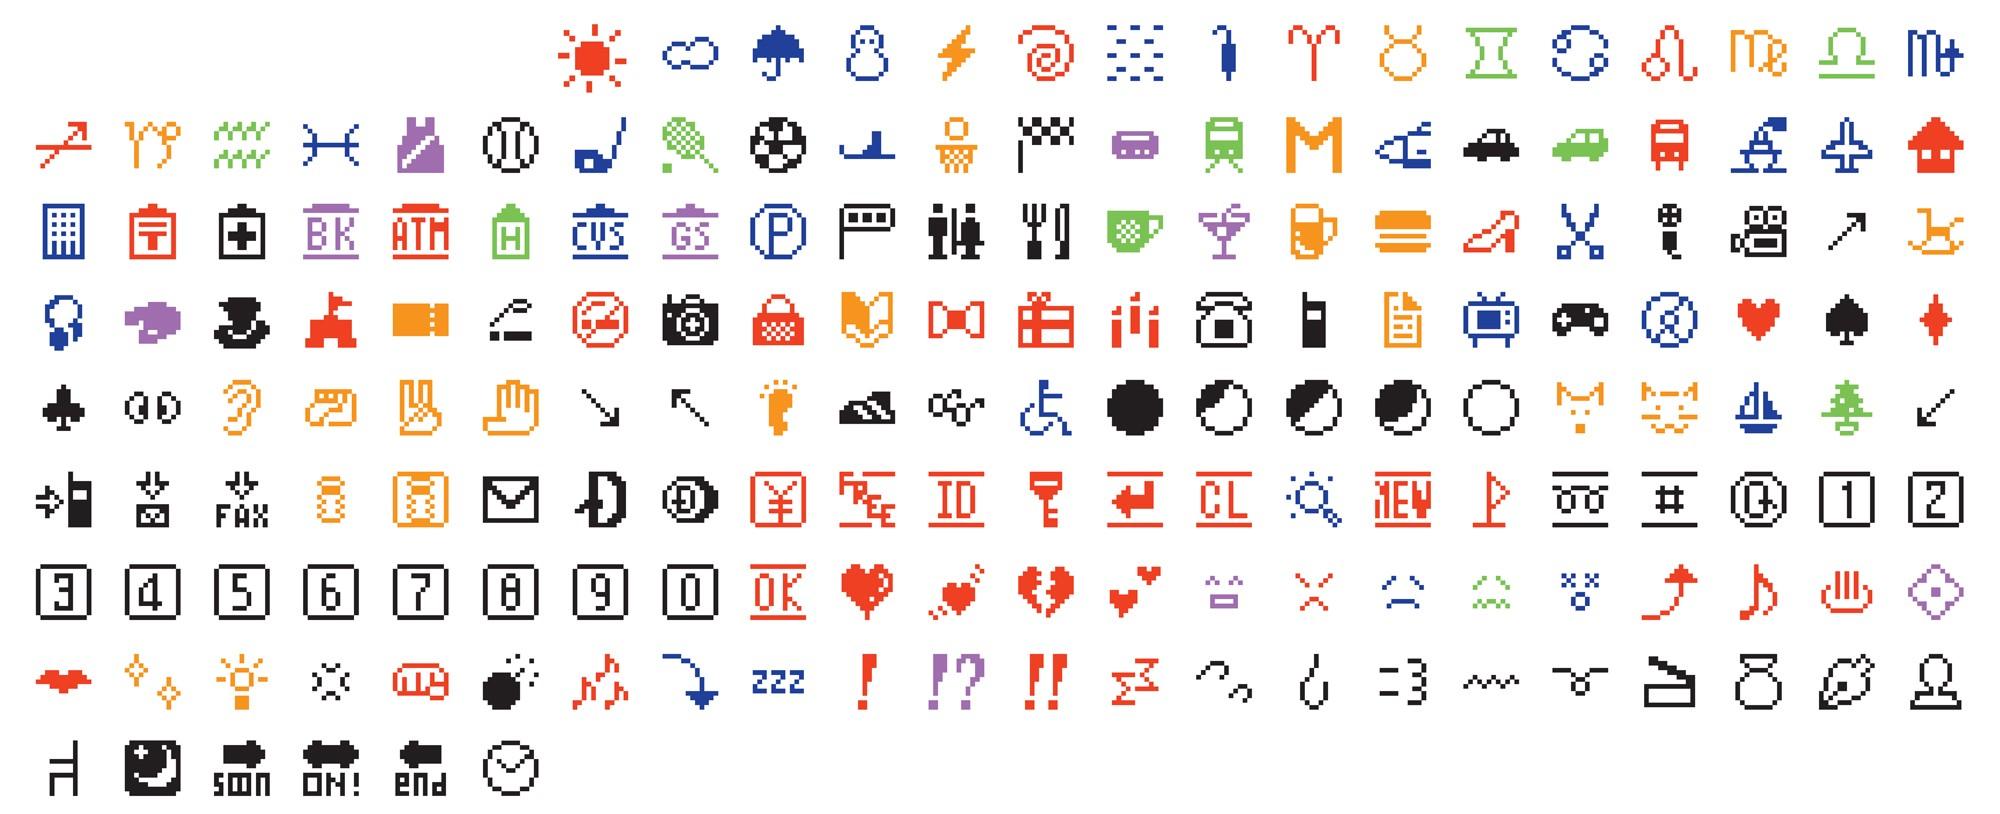 Original emoji set added to MoMA collection